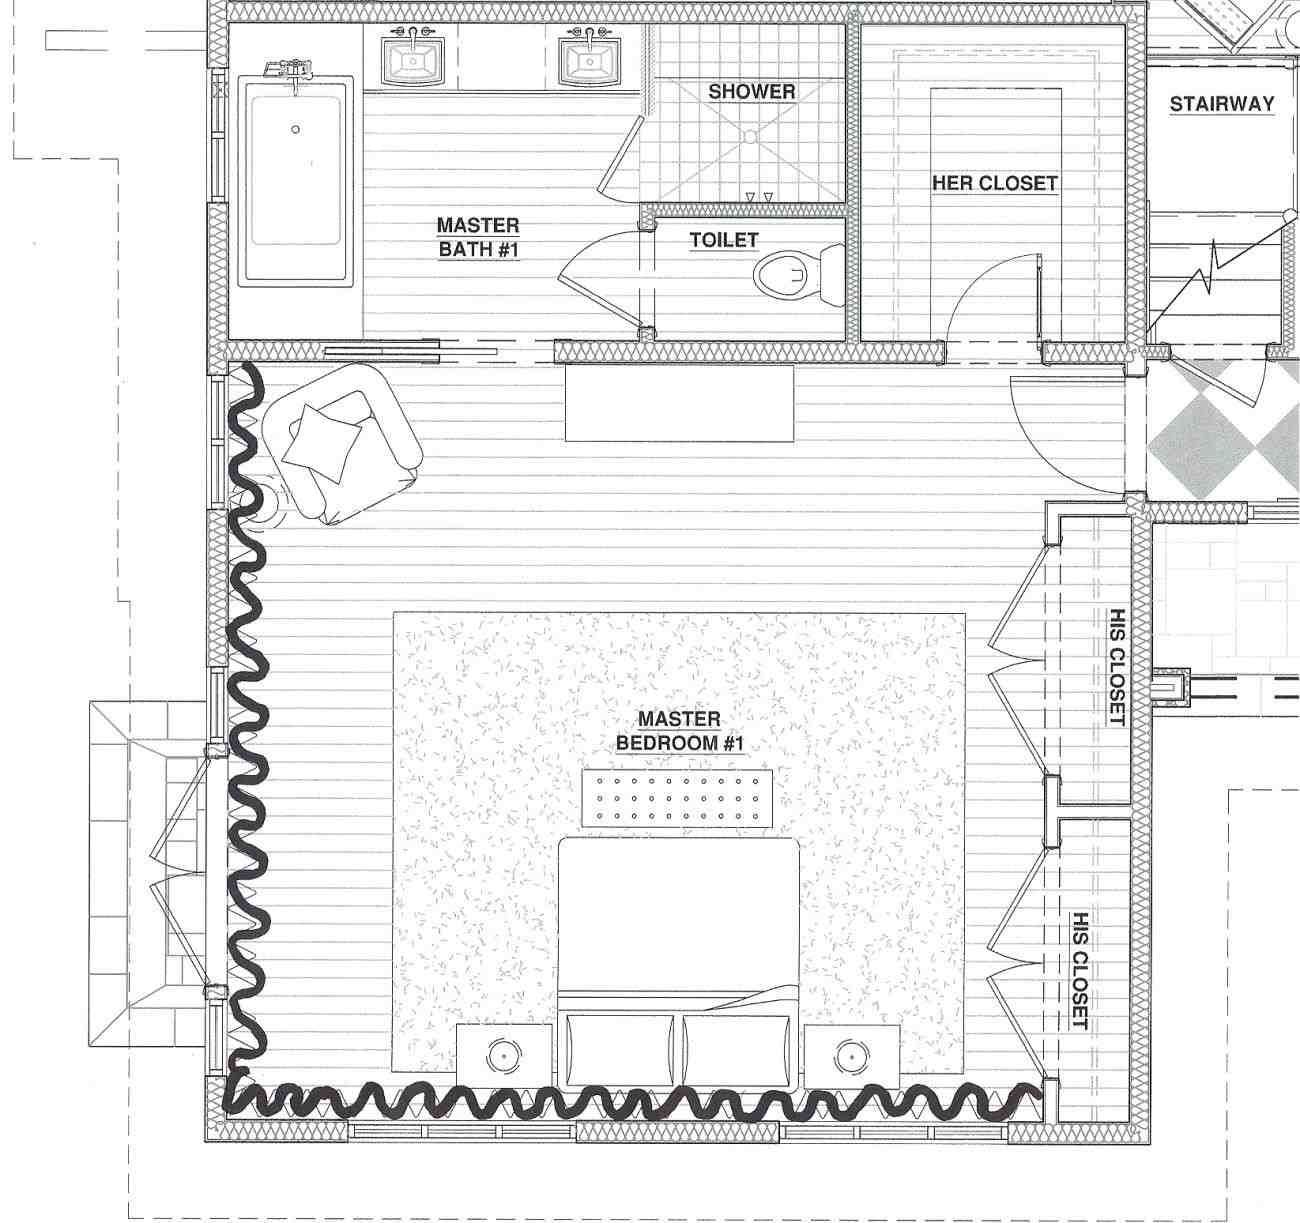 This Small Master Bathroom Plan Bathroom Remodel Plans Eco Friendly Bidet Remo Master Bedroom Floor Plan Ideas Master Bedroom Plans Master Suite Floor Plan